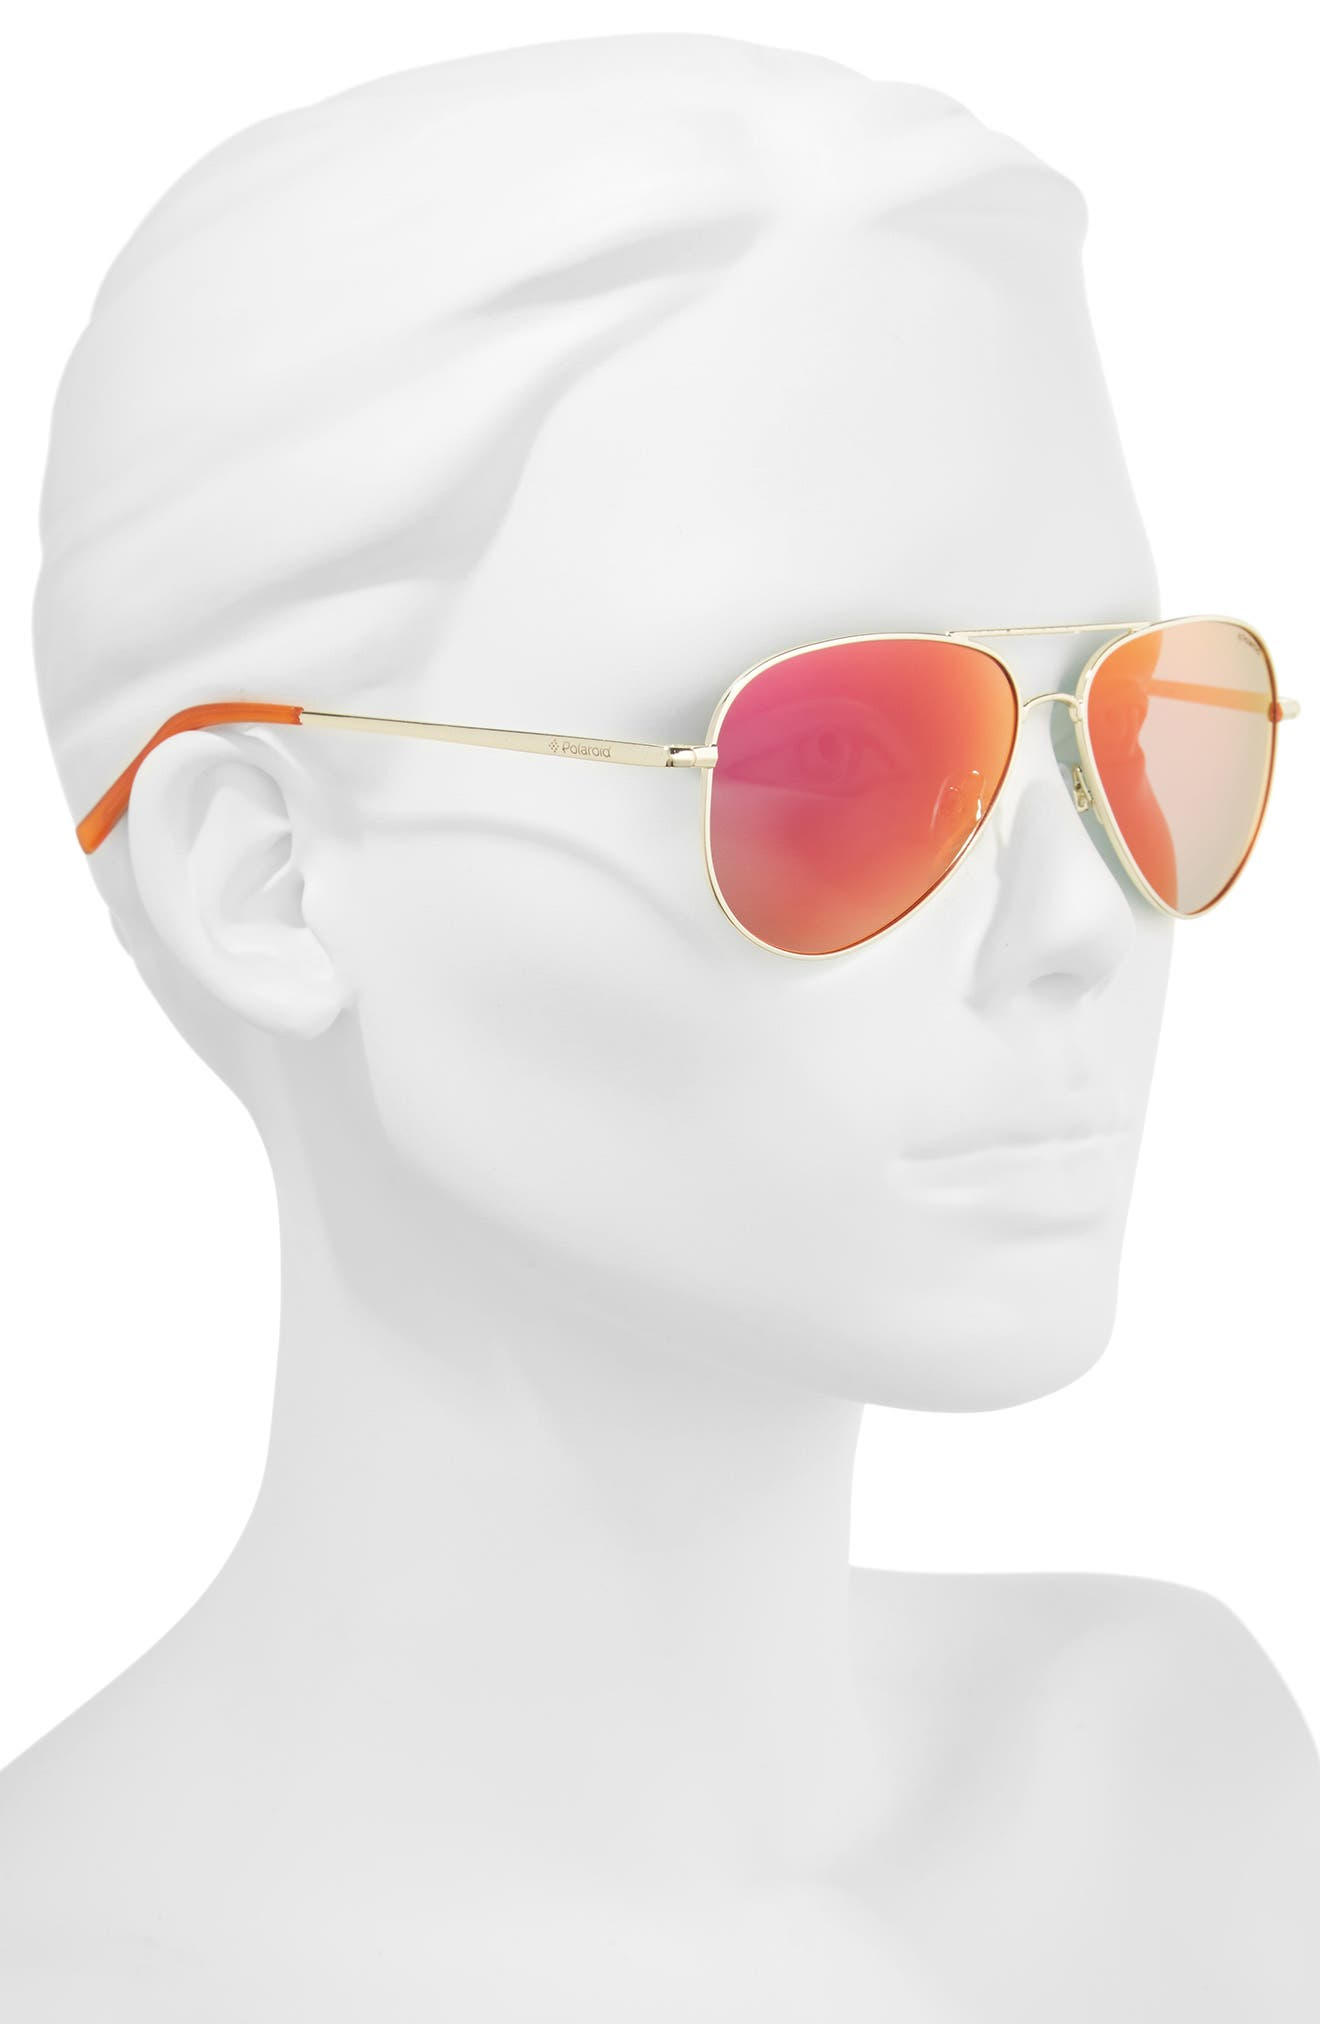 56mm Polarized Aviator Sunglasses,                             Alternate thumbnail 2, color,                             GOLD/ RED MIRROR